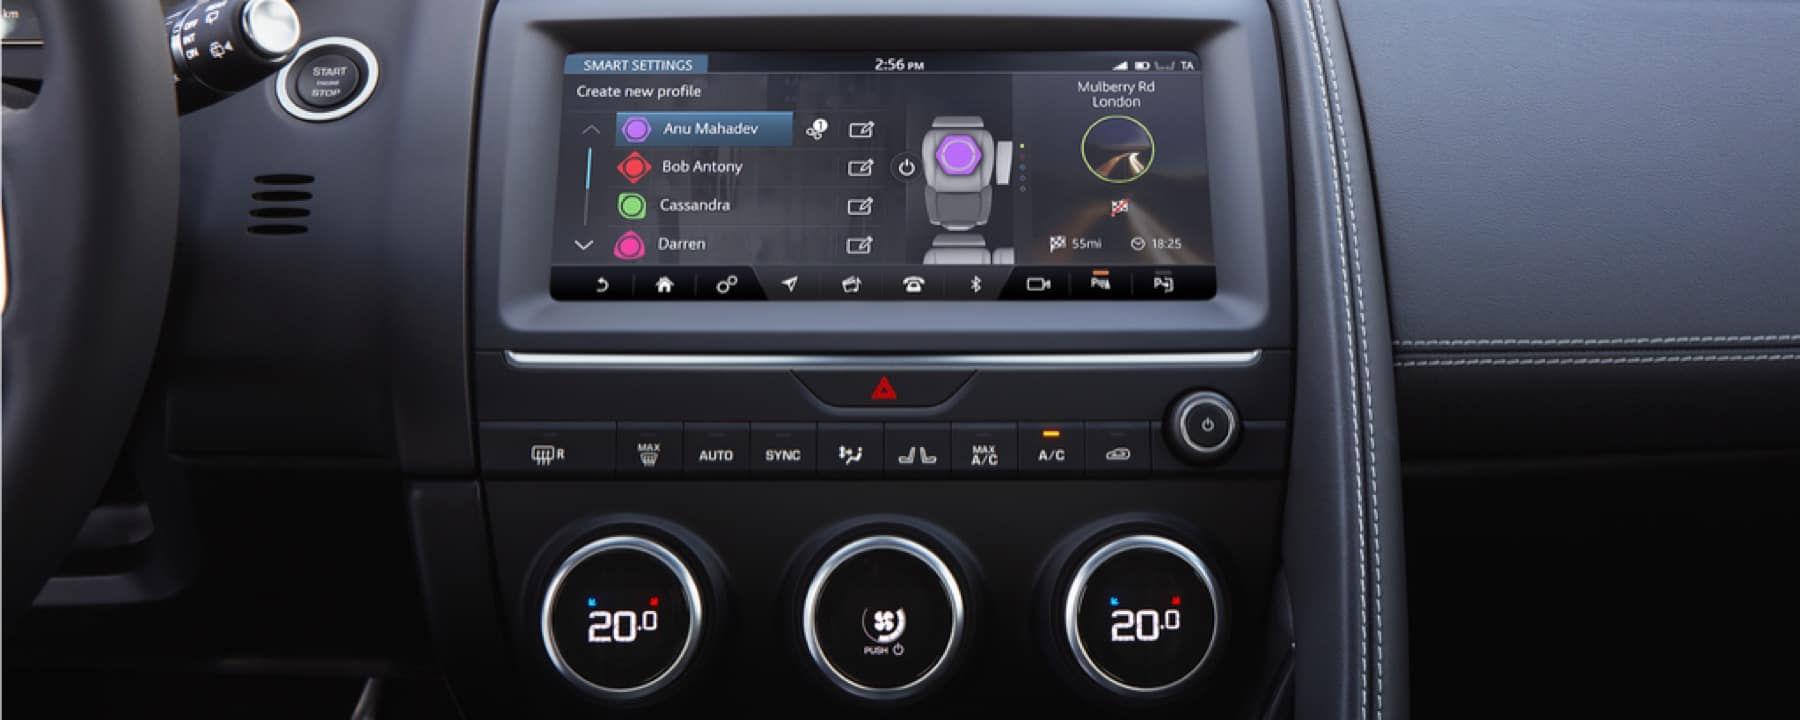 Mitsubishi kategorisi için resim